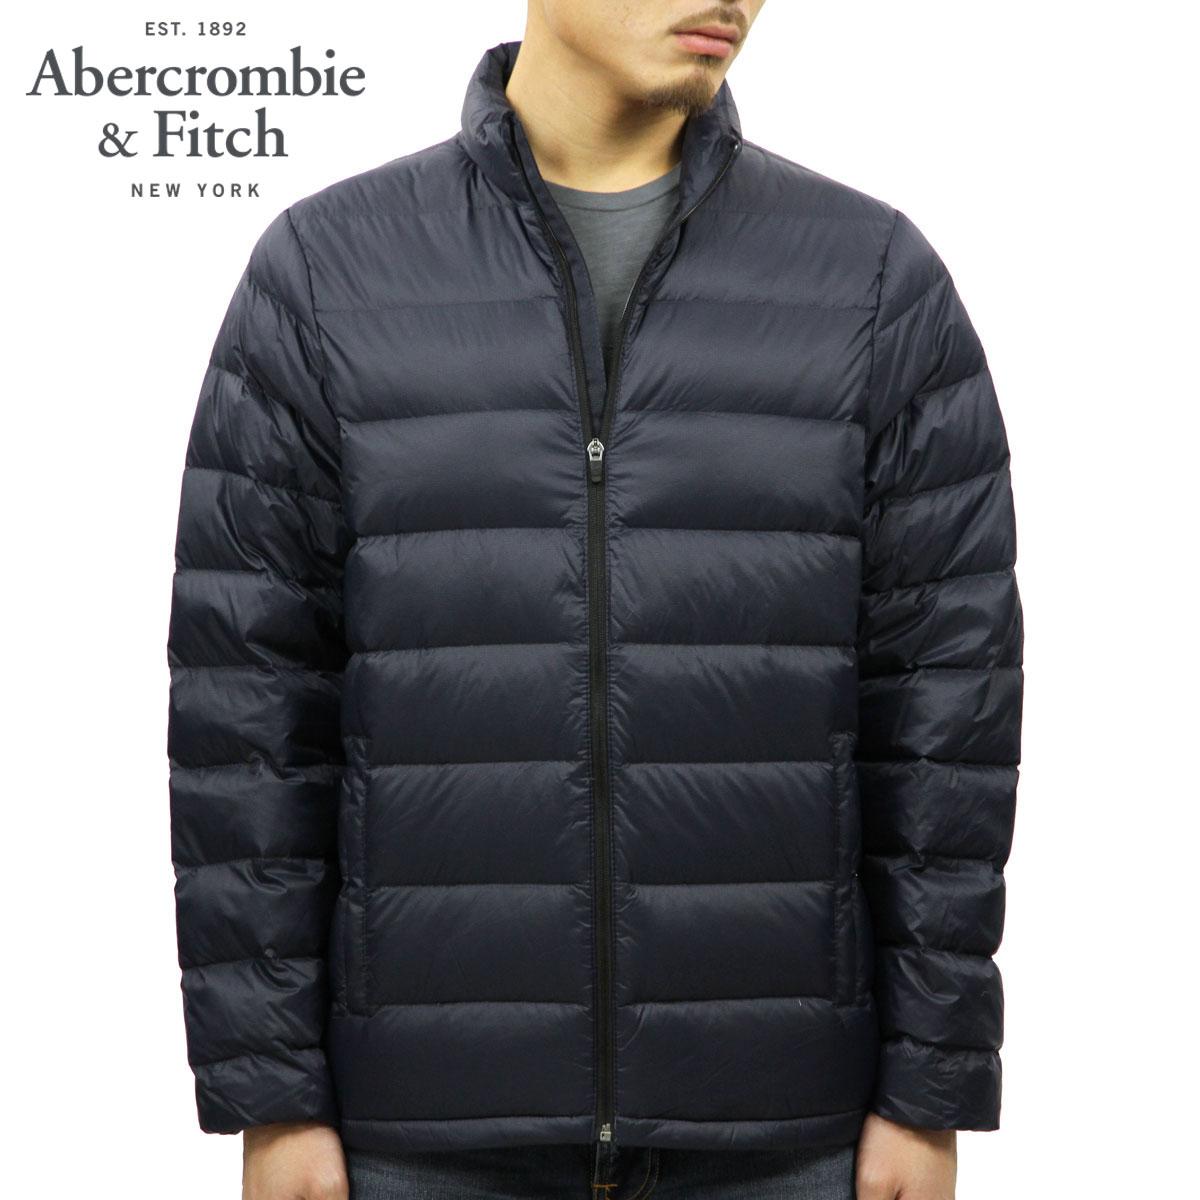 57b8bbda7 ABBA black down jacket men's regular article Abercrombie & Fitch outer  jacket LIGHTWEIGHT DOWN-FILLED PACKABLE PUFFER 132-328-1162-200